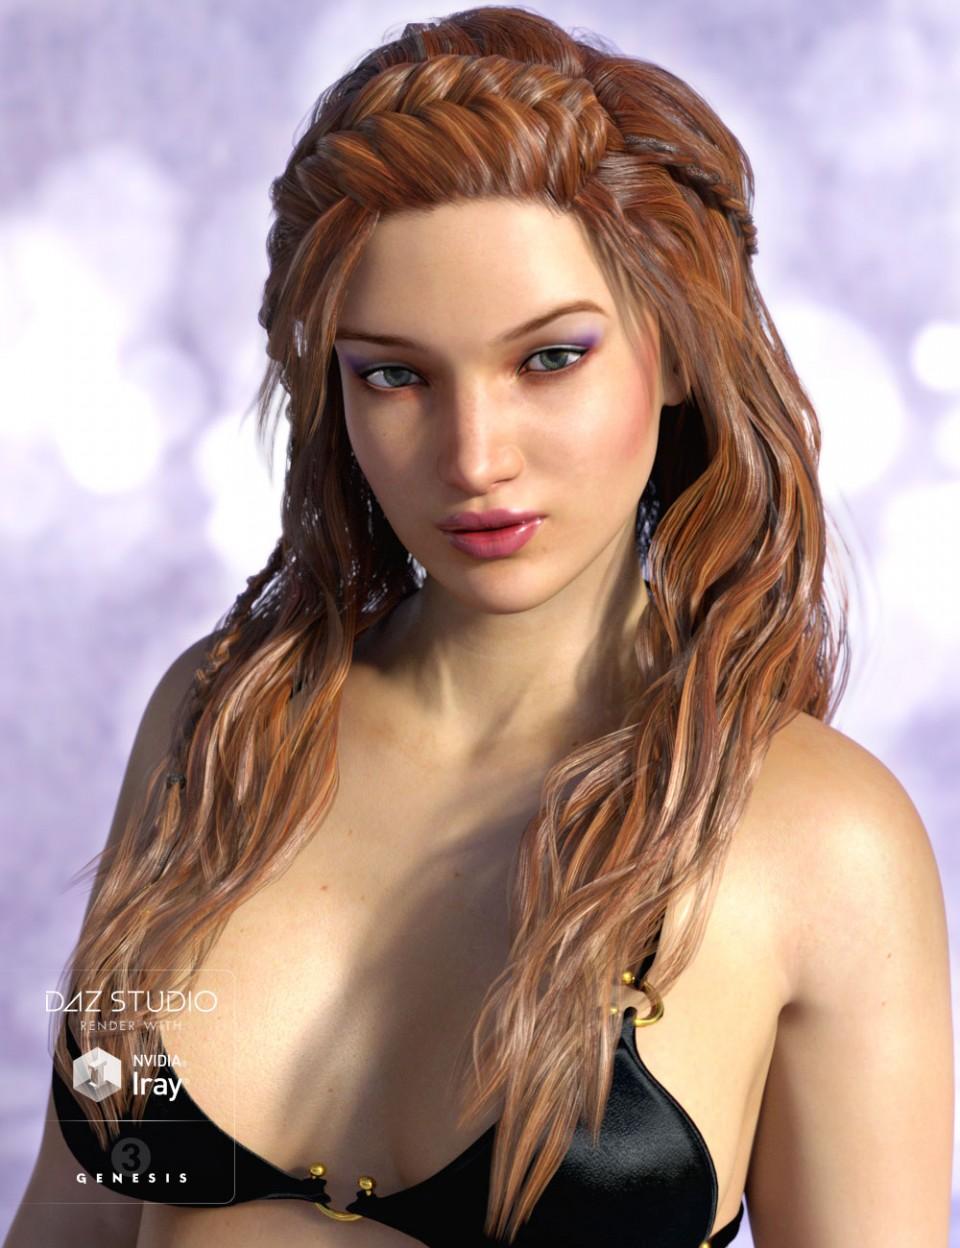 Poser and DAZ Studio 3D Models: Hair|DAZ Studio and Poser